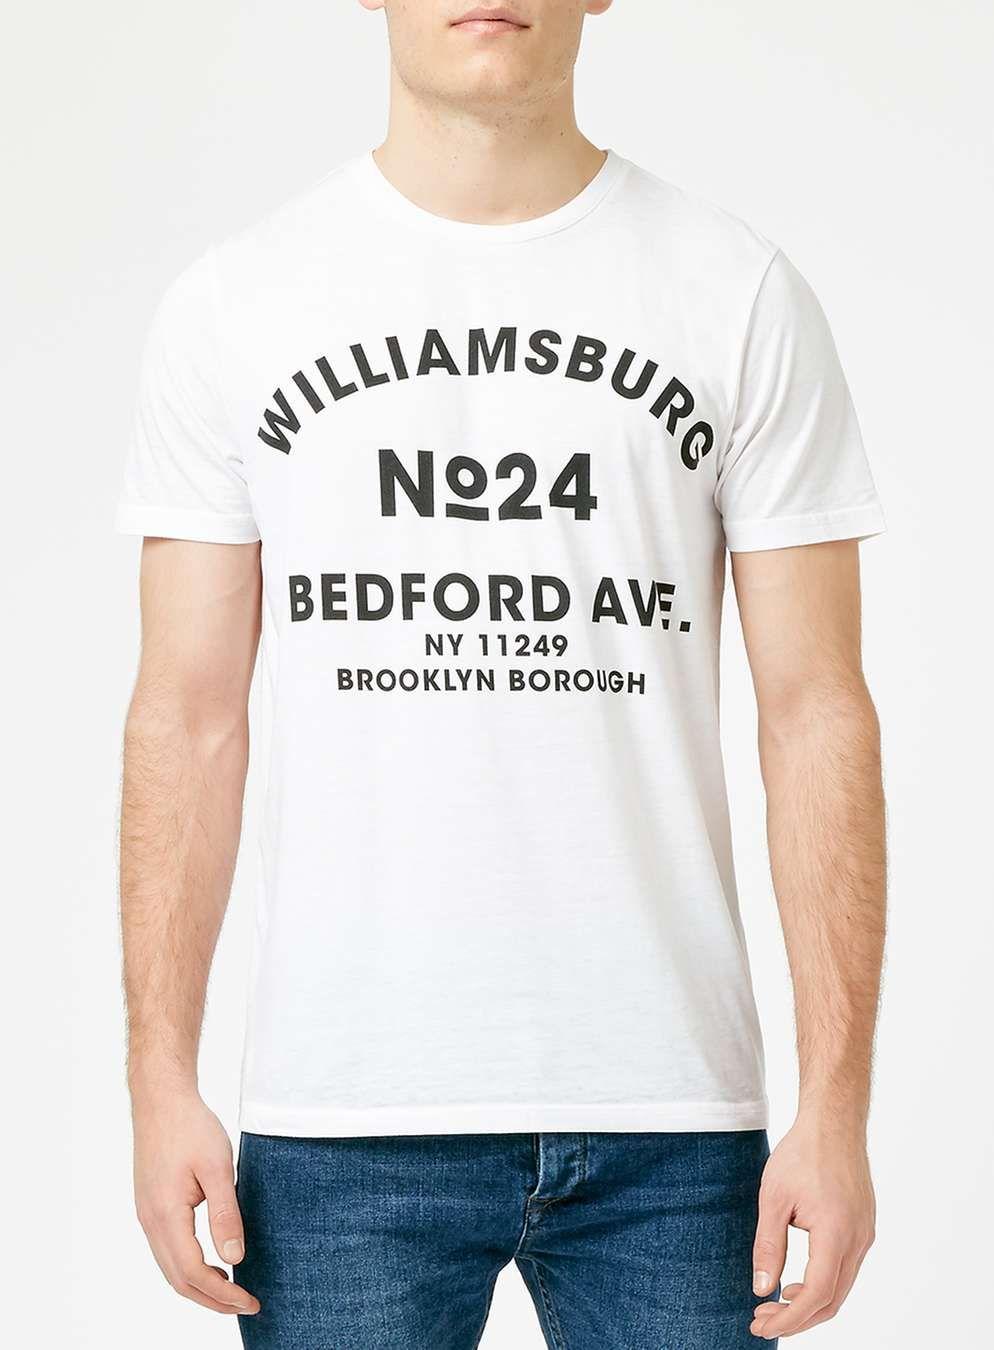 6f6c8b49f Good Guys T Shirts   Kuenzi Turf & Nursery